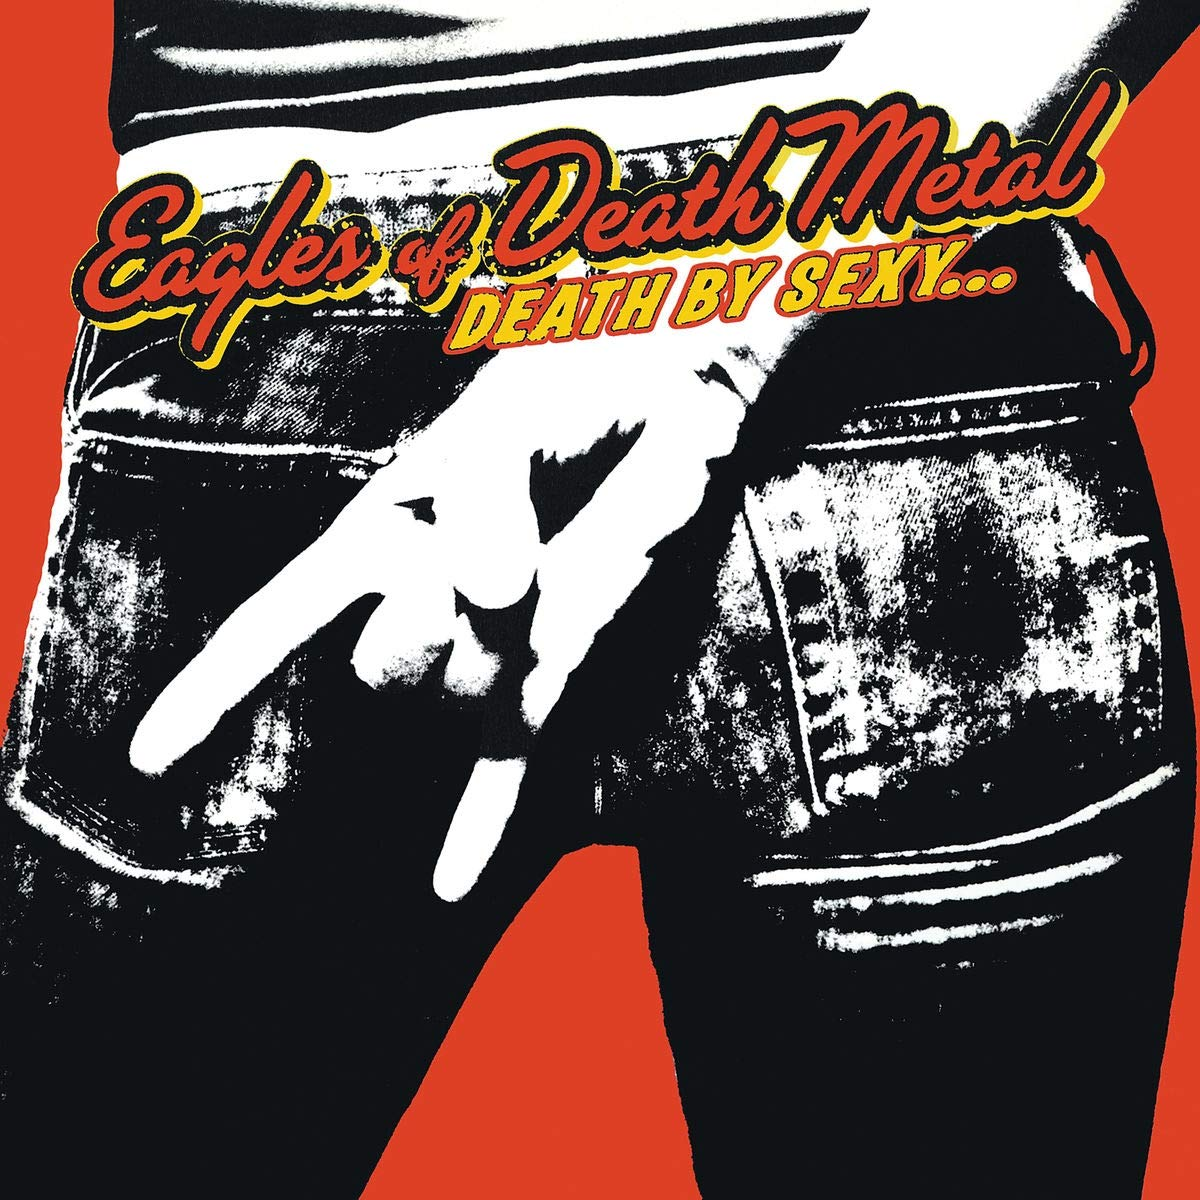 CD Shop - EAGLES OF DEATH METAL DEATH BY SEXY